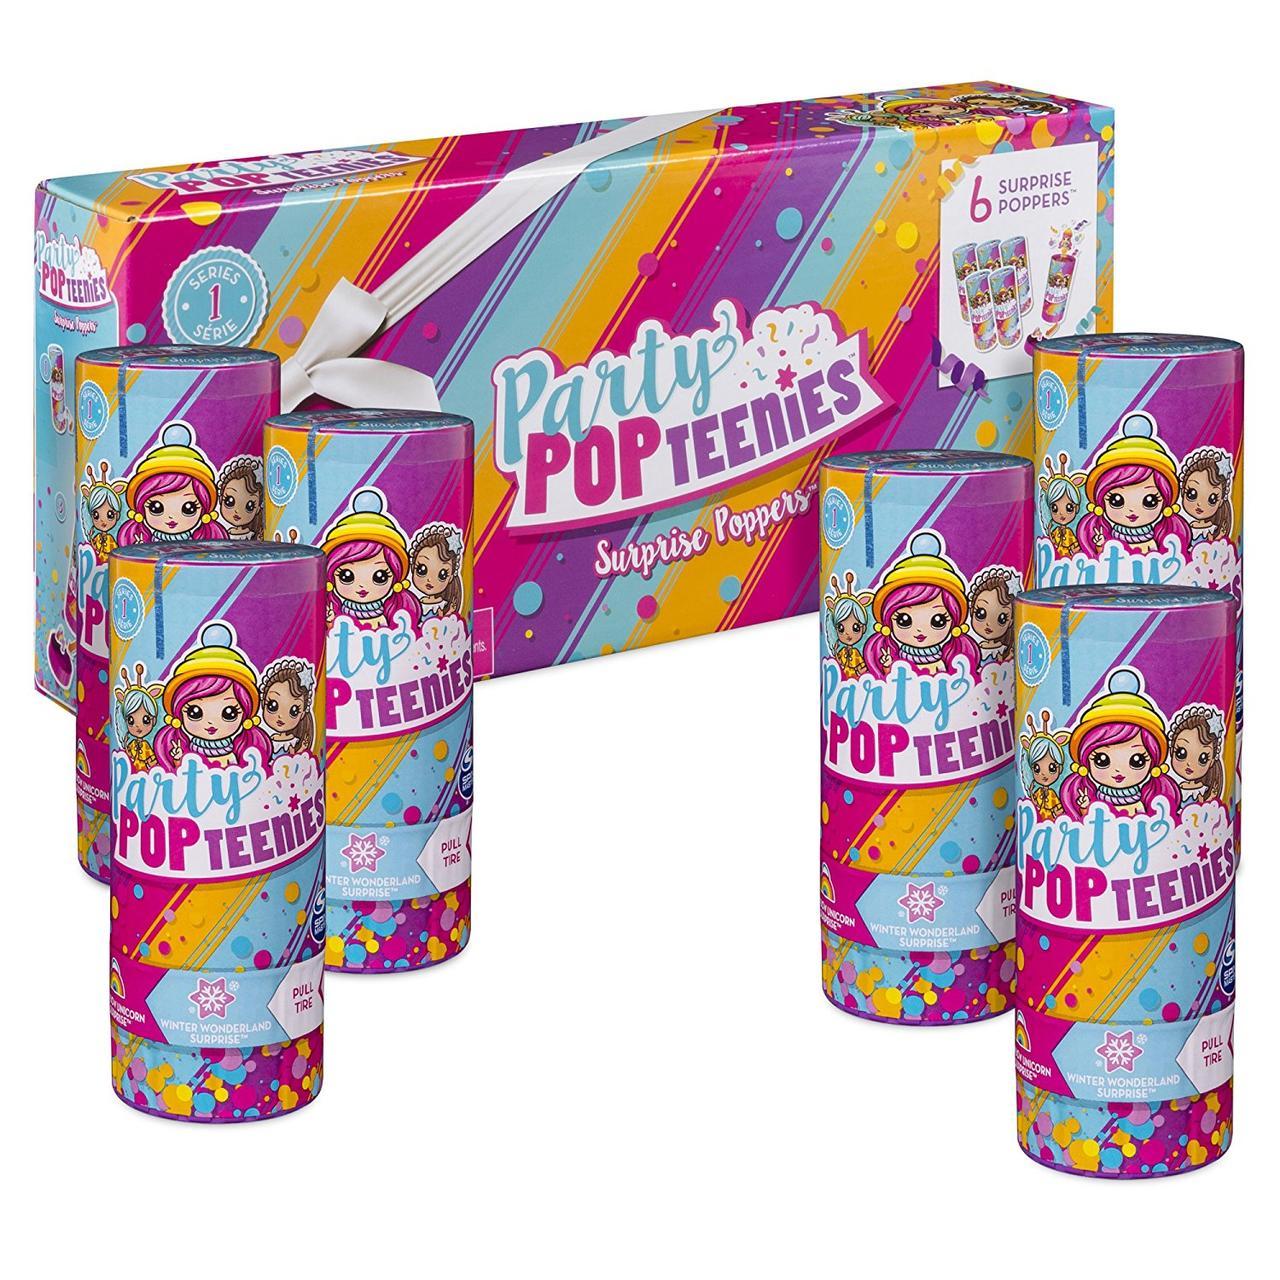 Набор Party Popteenies: 6 штук куколки, хлопушка-сюрприз, Spin Master из США